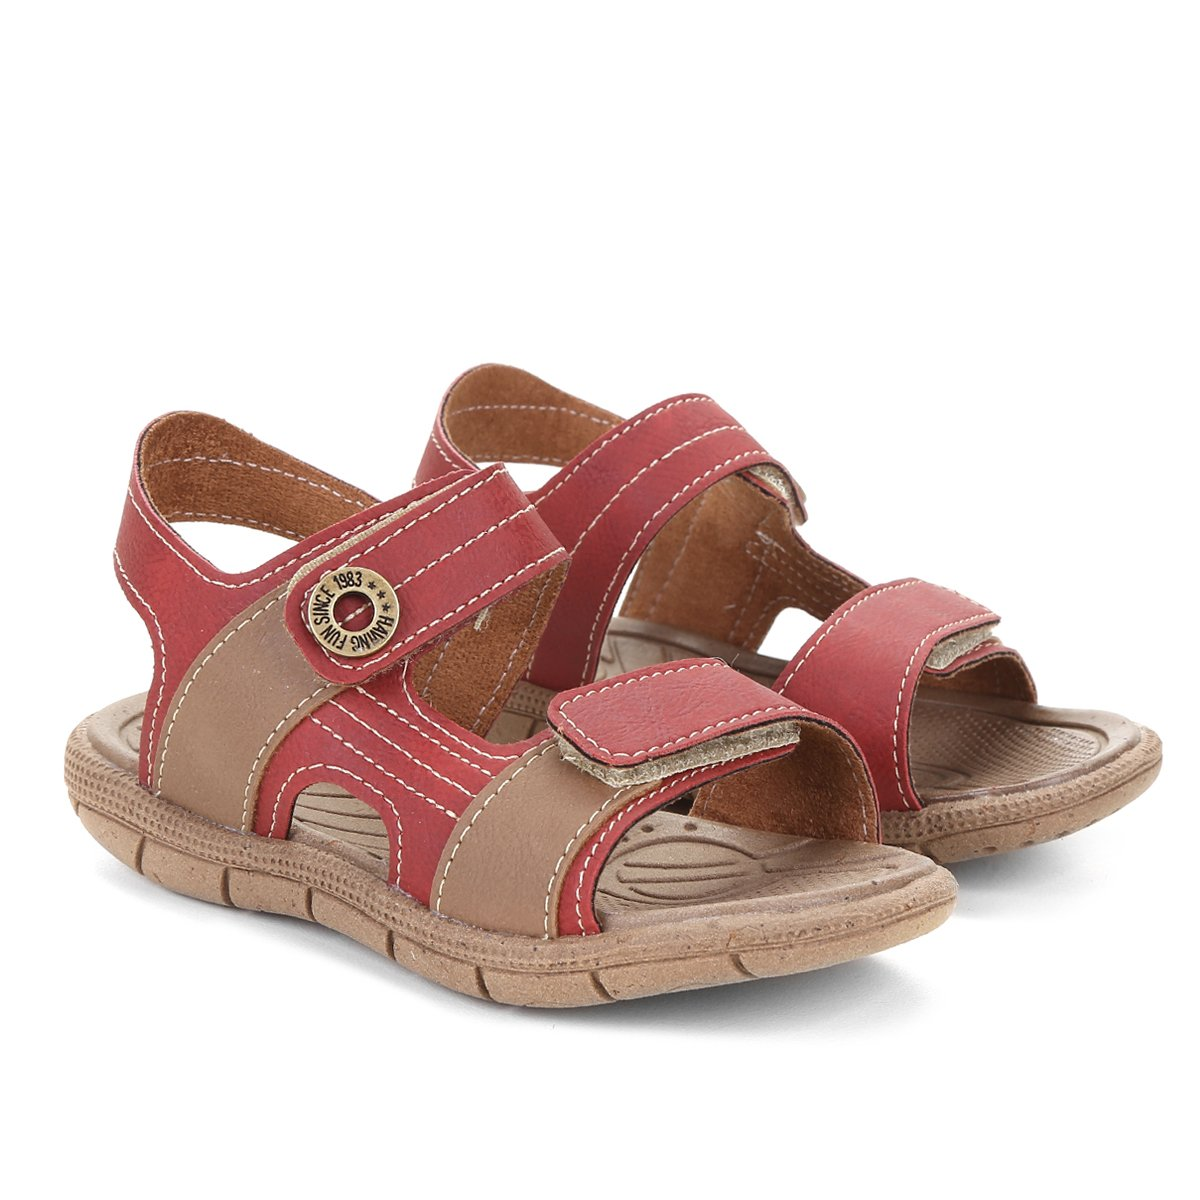 a6f1987775 FornecedorNetshoes. Sandália Infantil Klin Tic Tac Casual Menino